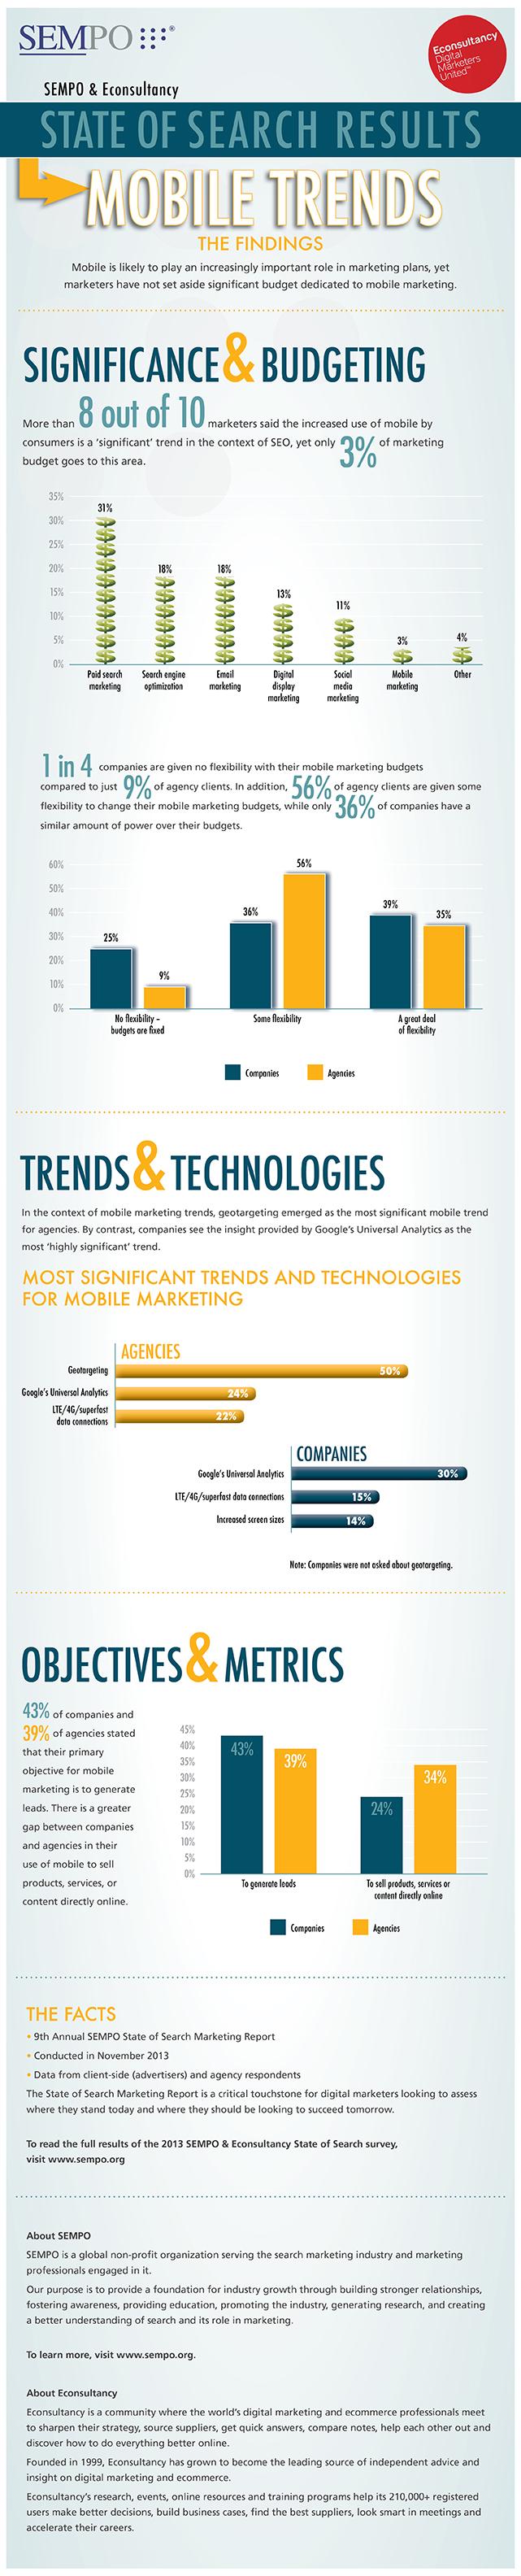 Sempo_SOS_Infographic_MobileTrends